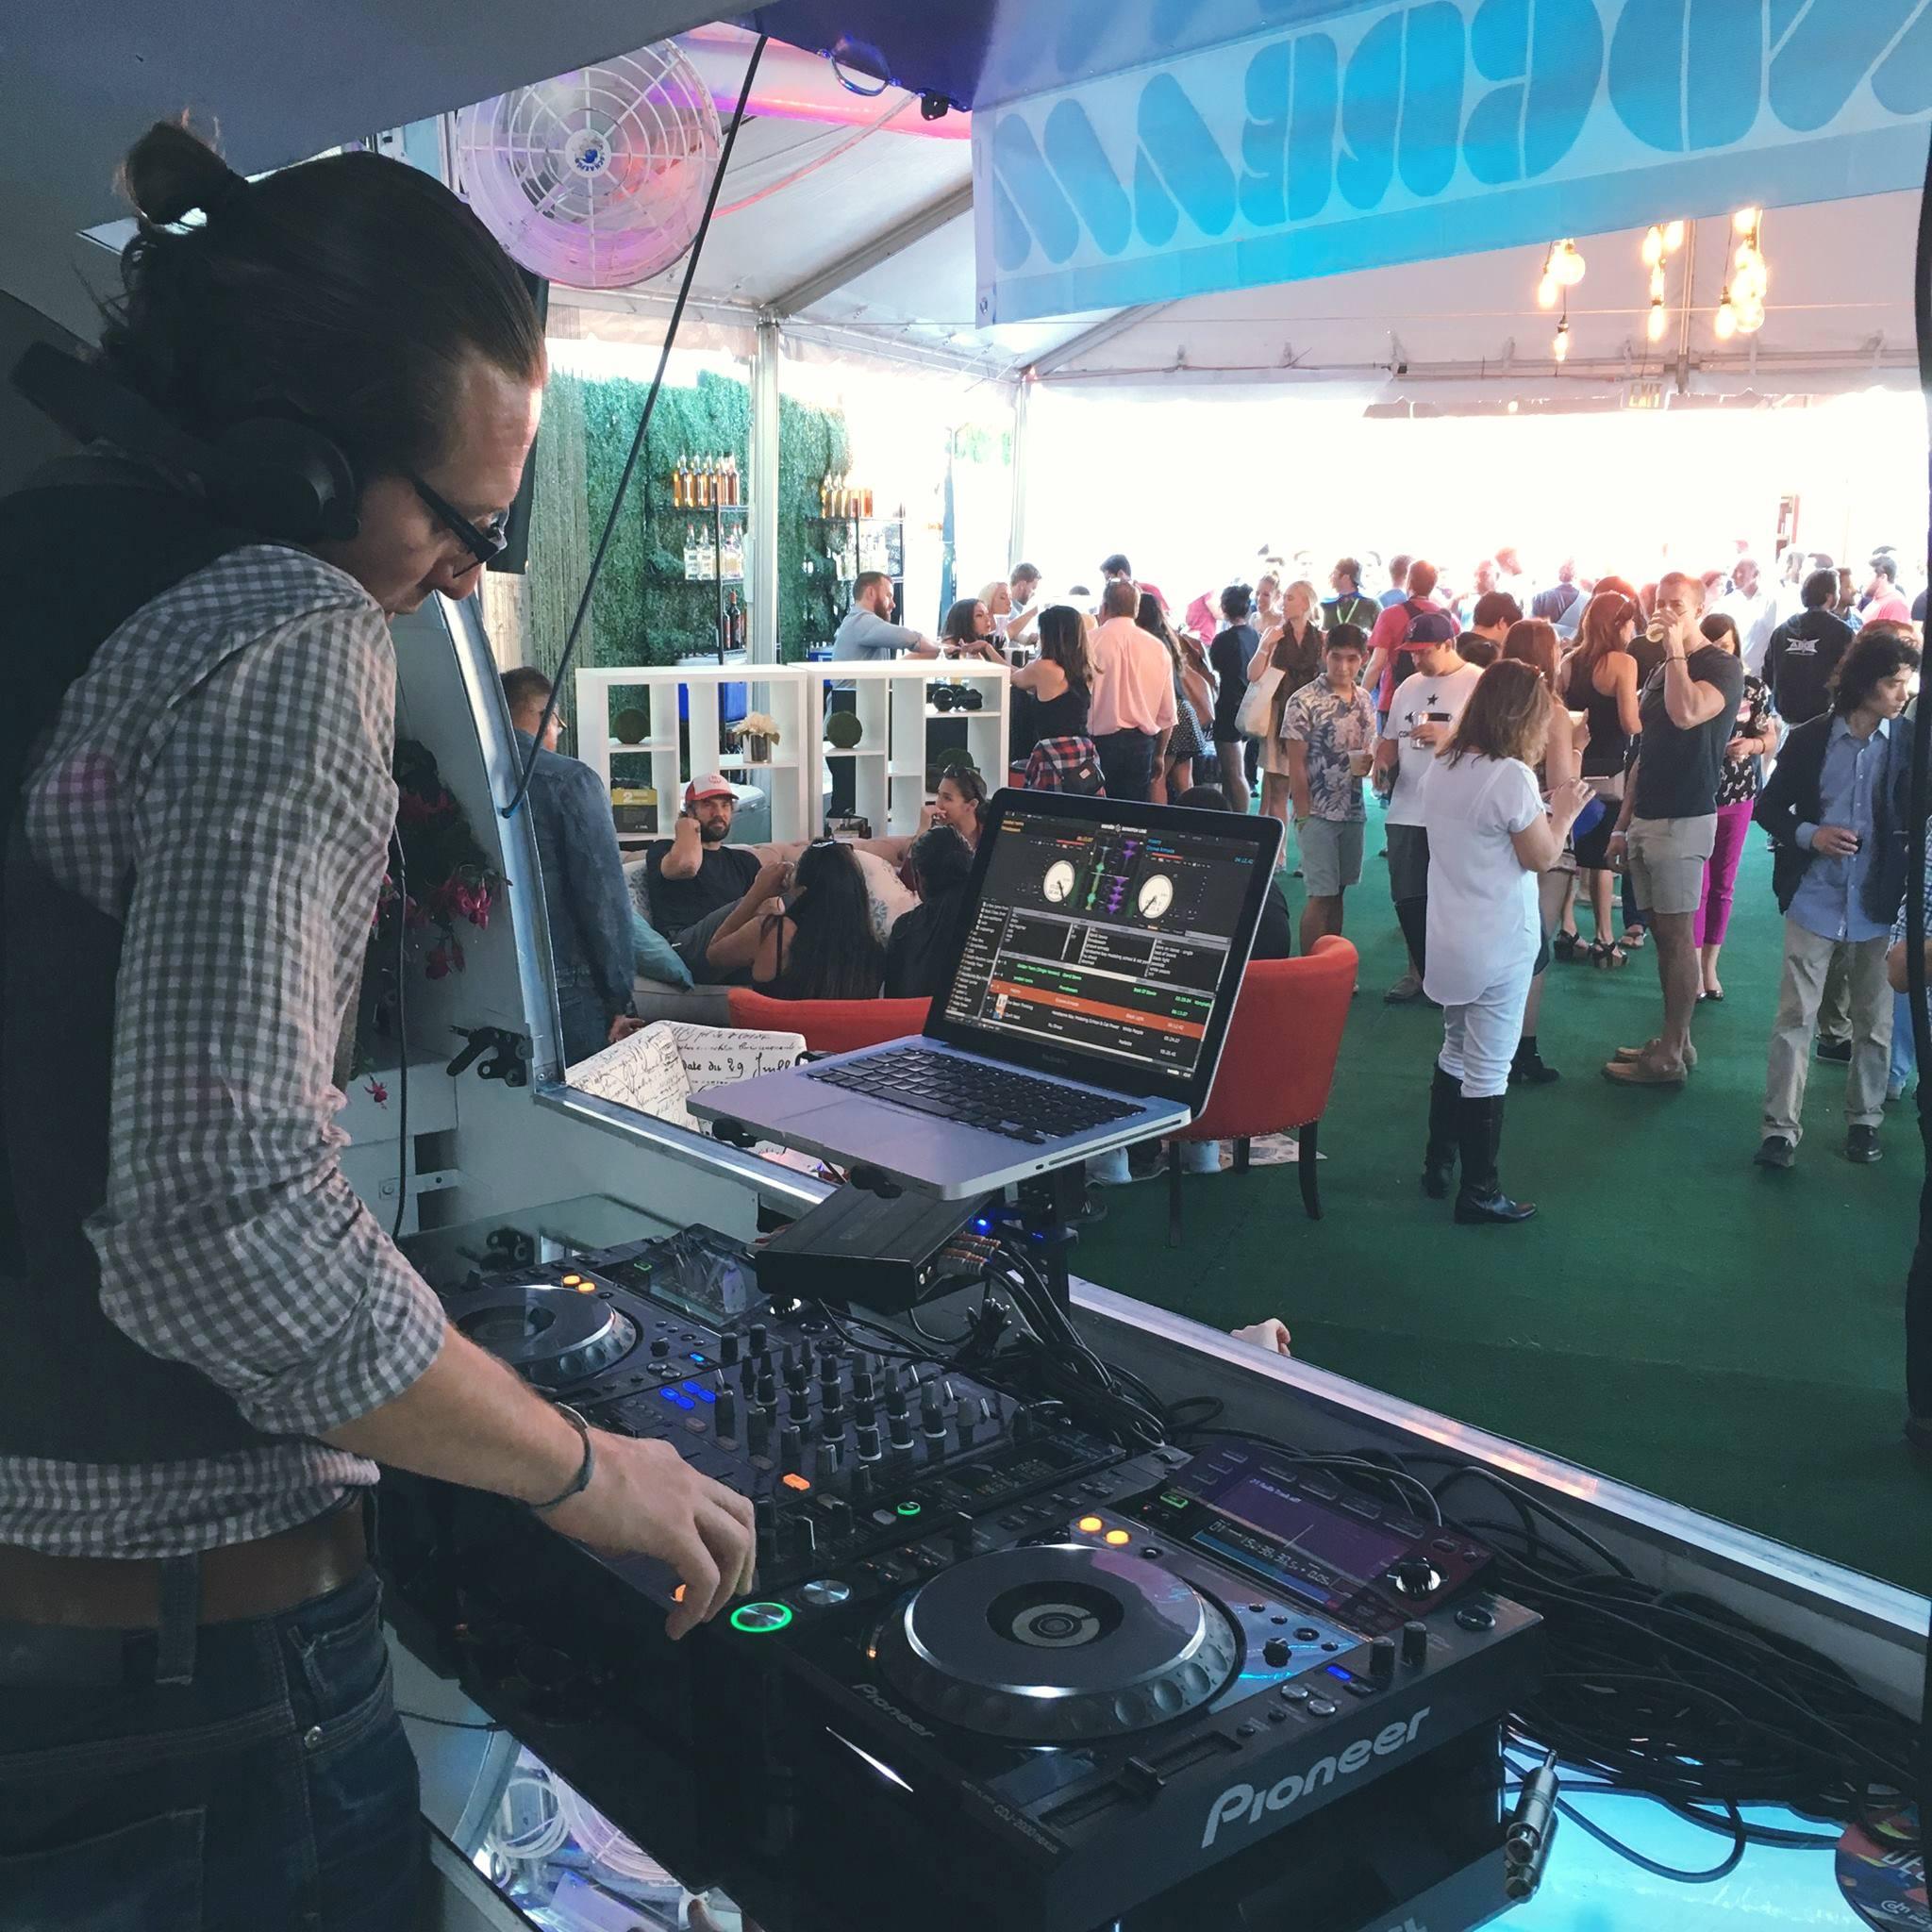 Dj's of Soundcream Airstream